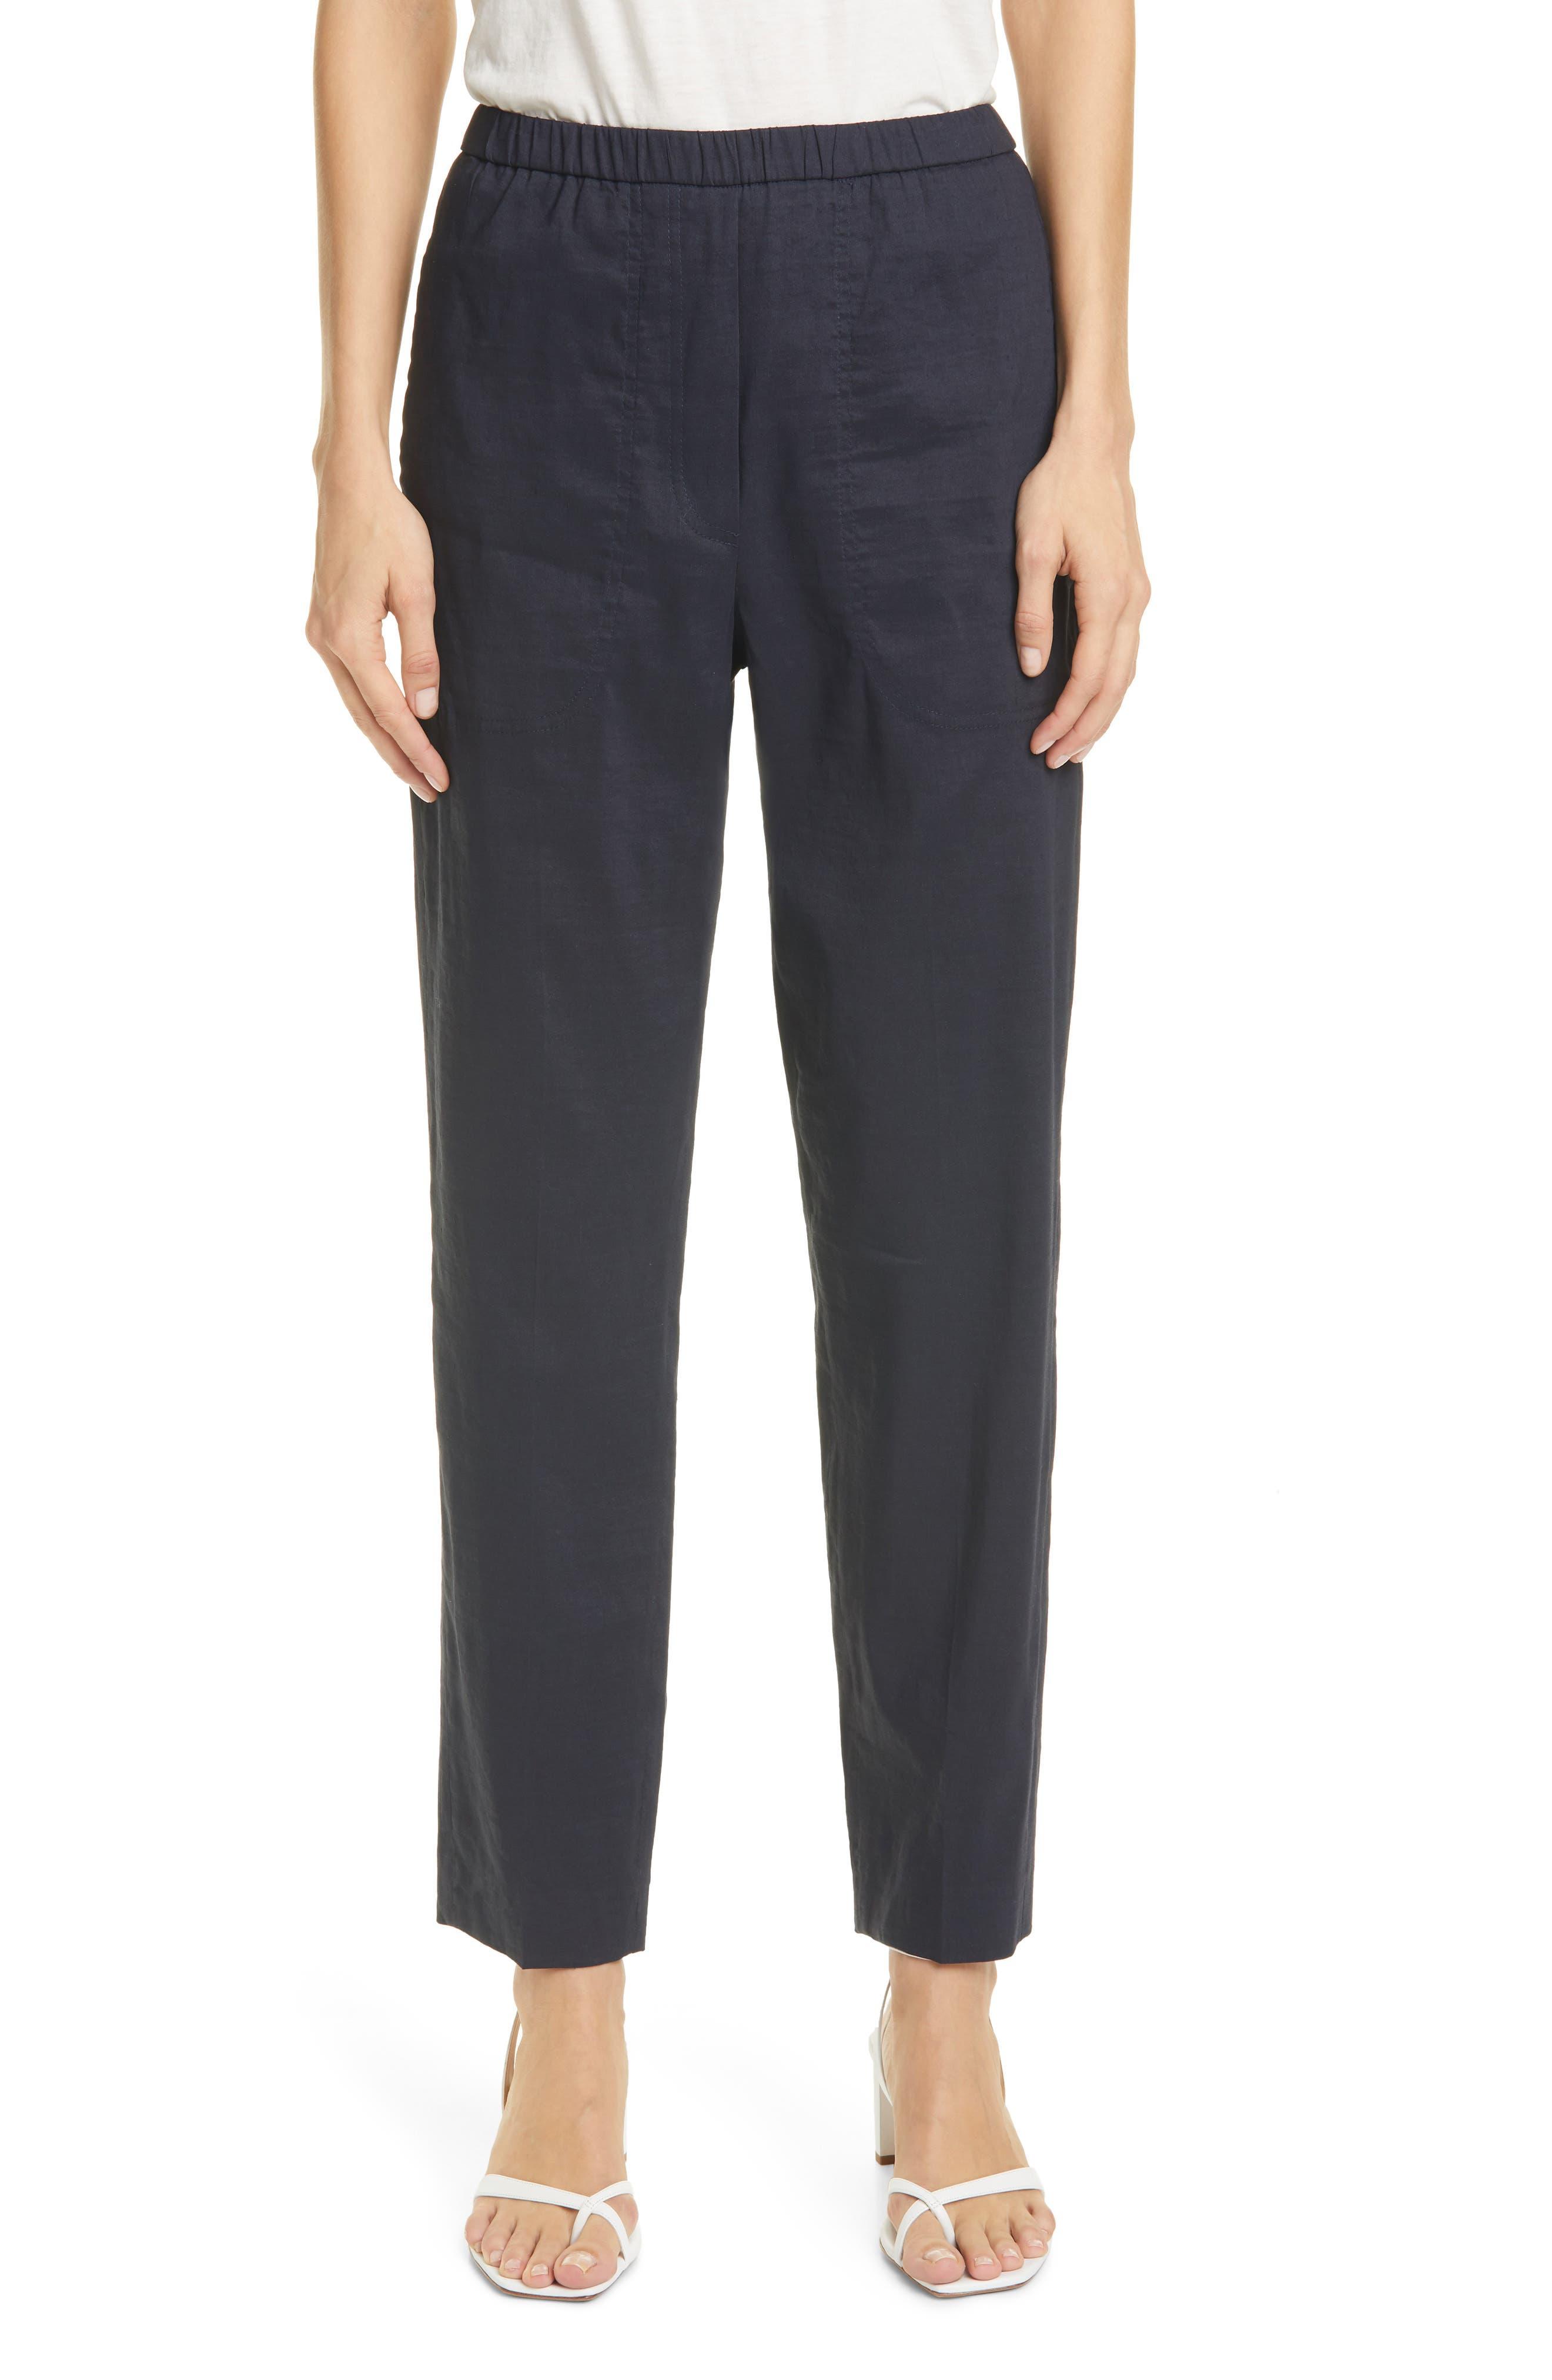 Image of SEVENTY VENEZIA Seventy Linen Stretch Pants